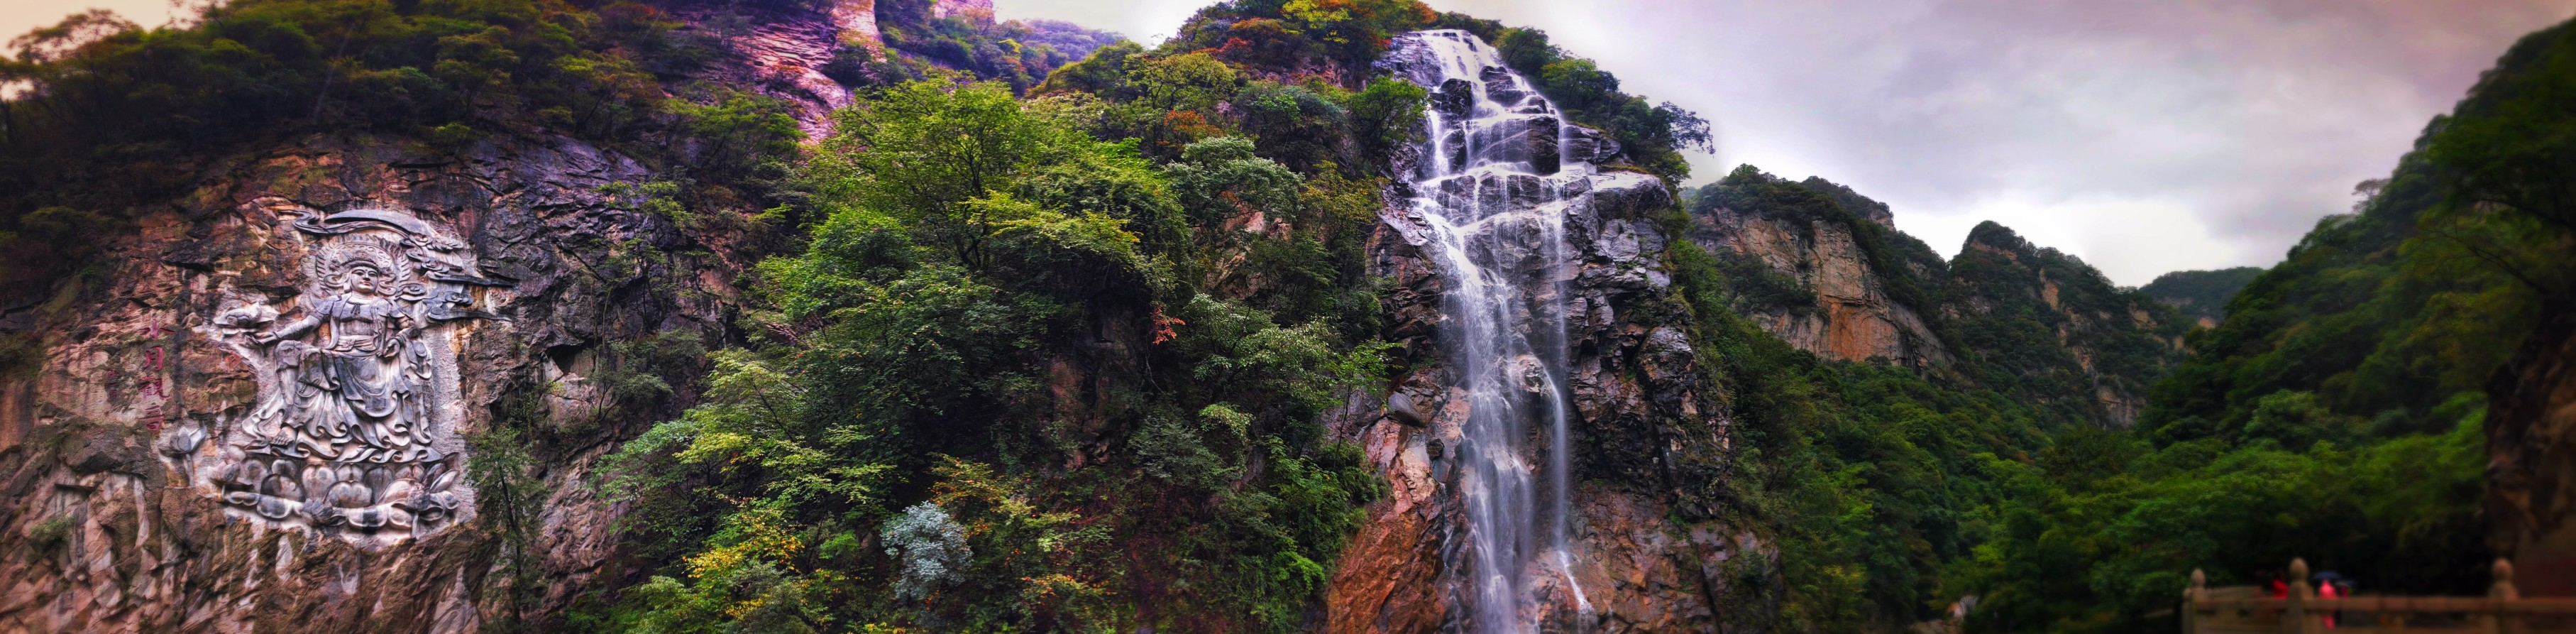 Waterfall at Taibai Mountain National Park Panoramic 1